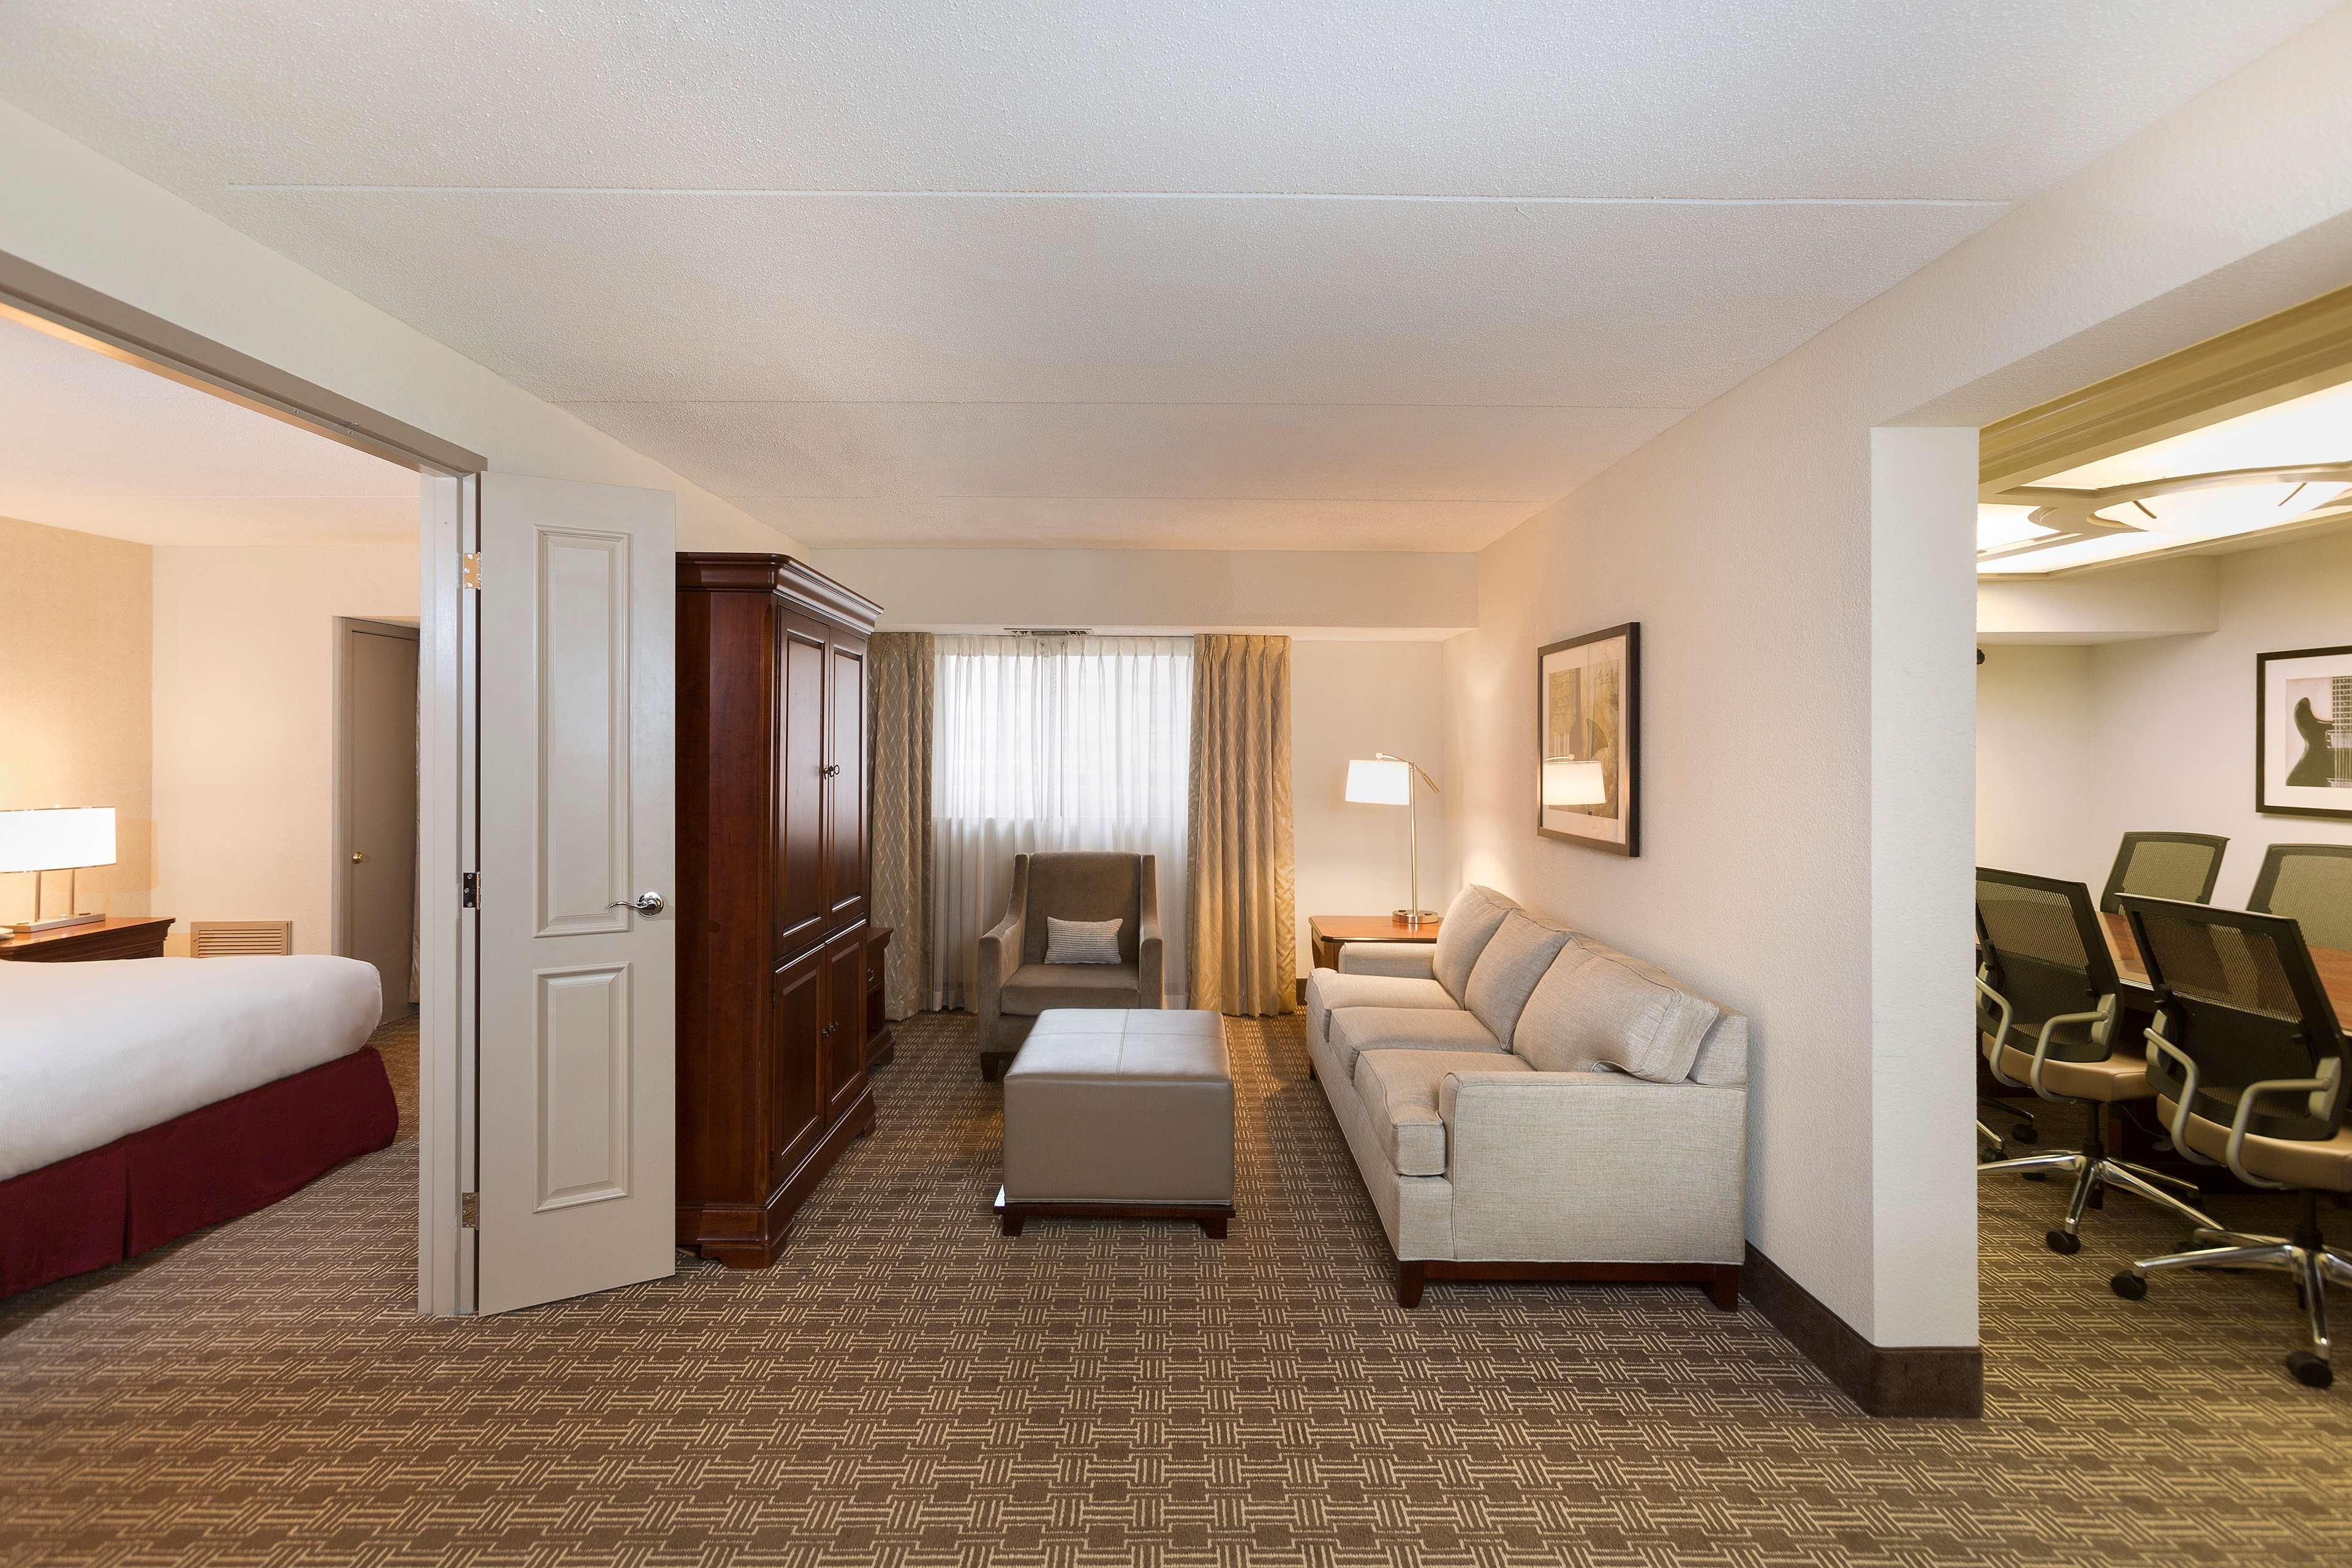 DoubleTree Suites by Hilton Hotel Nashville Airport image 34